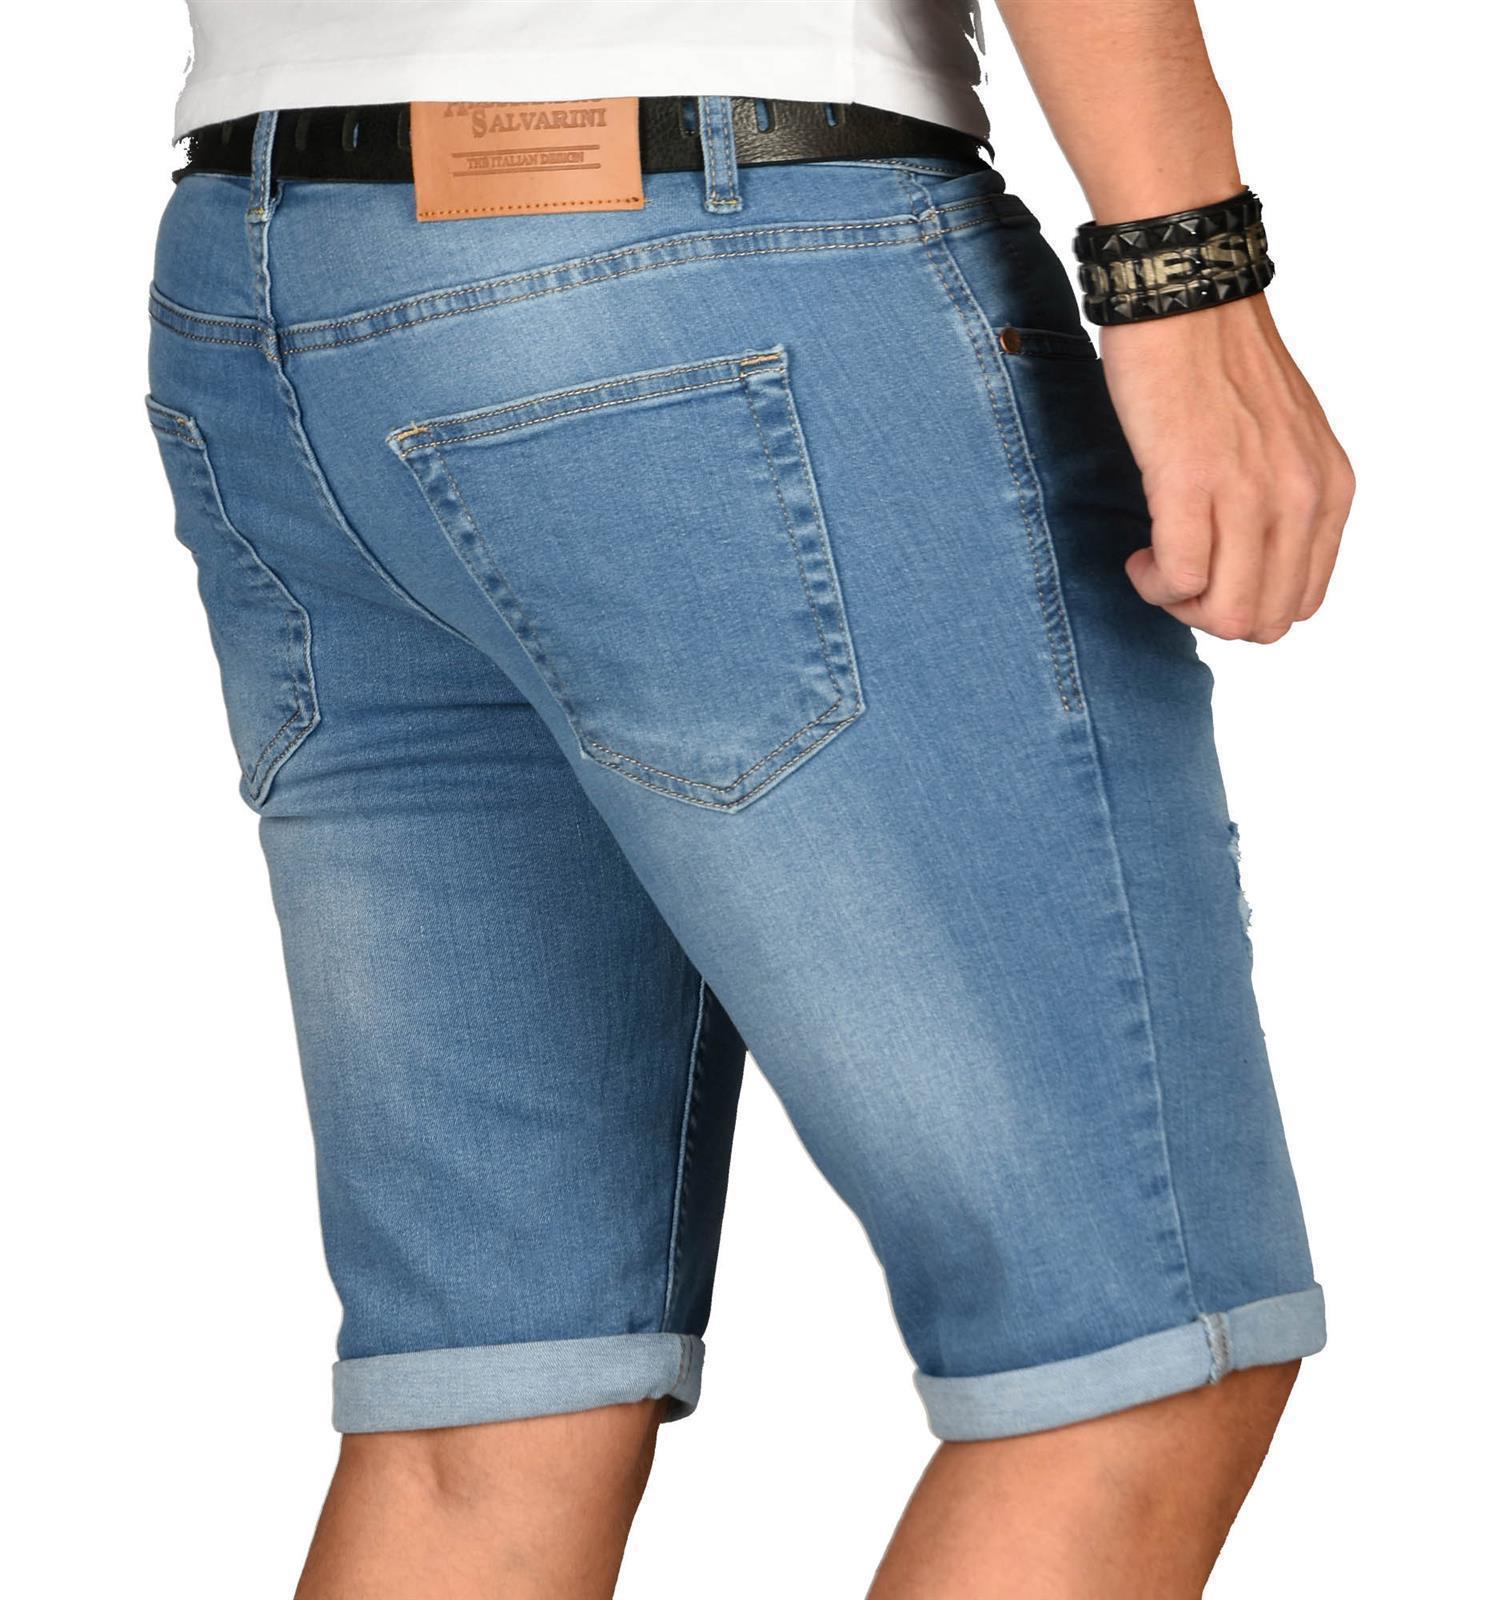 A-Salvarini-Herren-Designer-Jeans-Short-kurze-Hose-Slim-Sommer-Shorts-Washed Indexbild 20